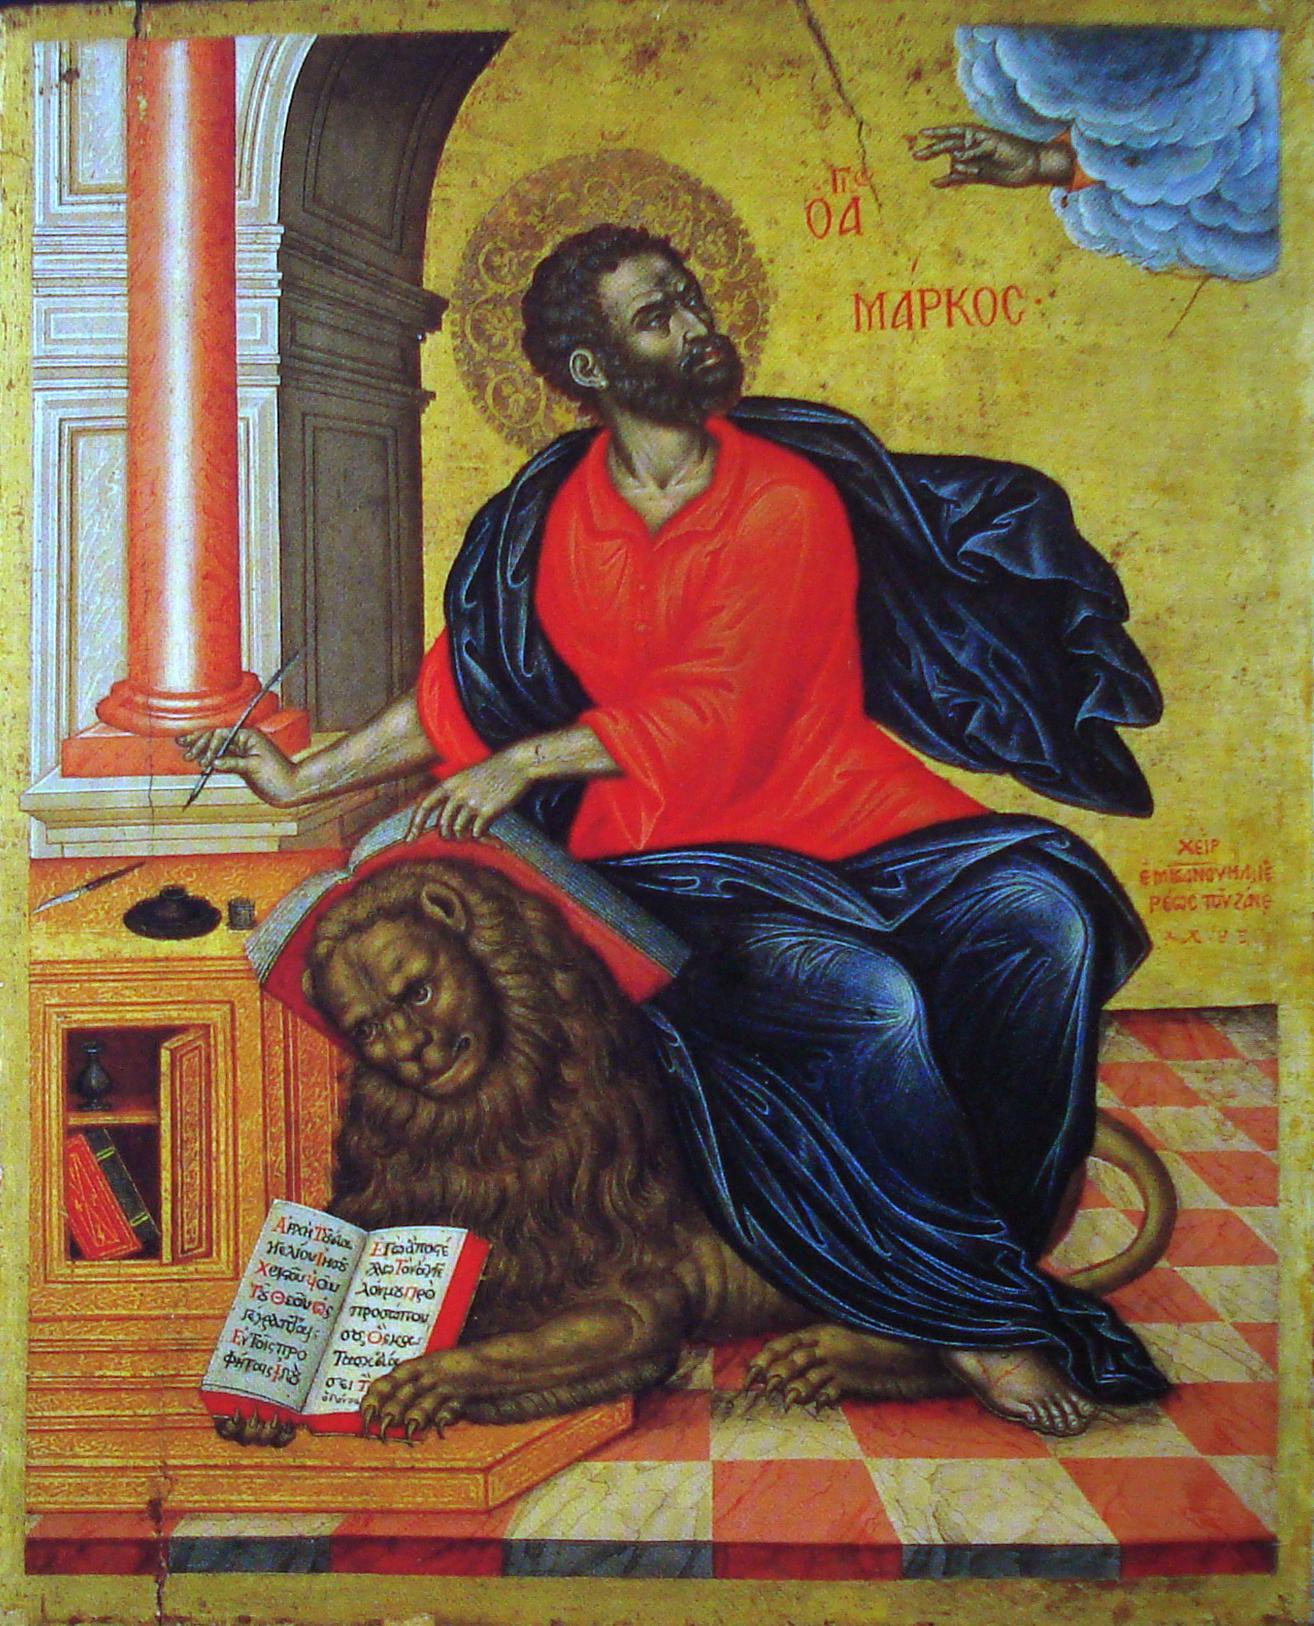 Emmanuel_Tzanes_-_St._Mark_the_Evangelist_-_1657